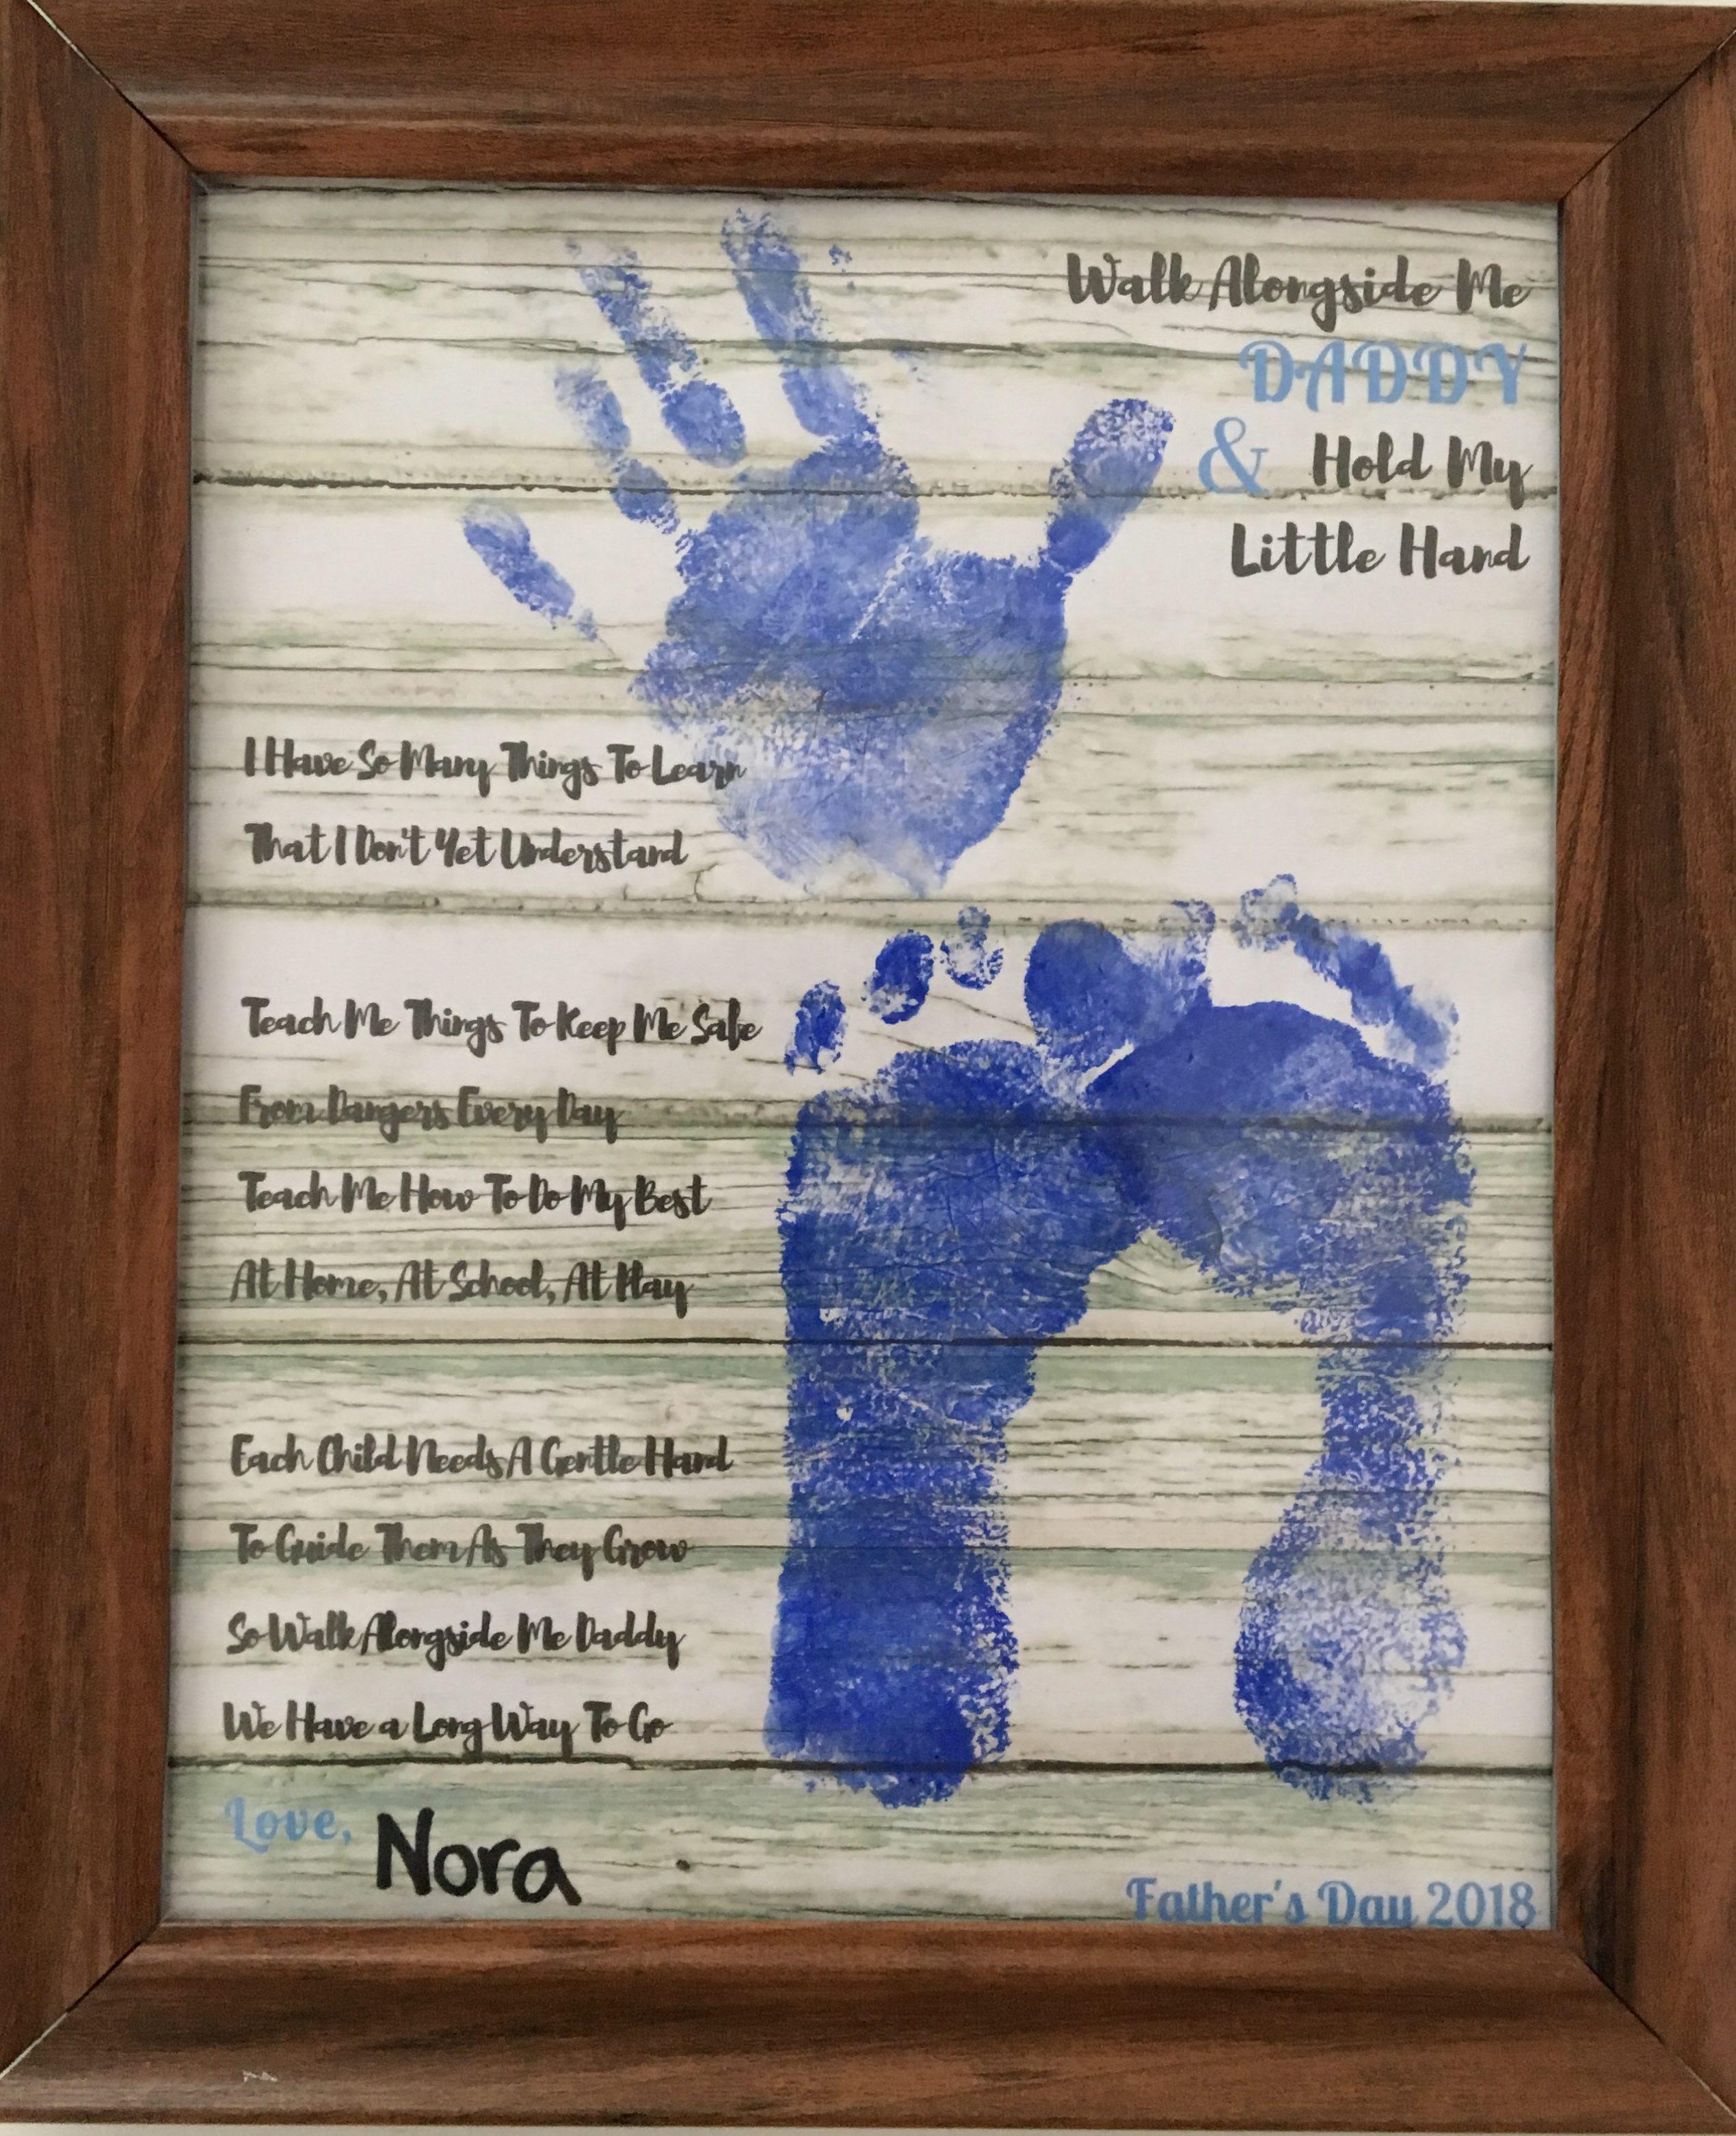 Fathers Day Gift Idea Walk Alongside Me Keepsake Poem A Good